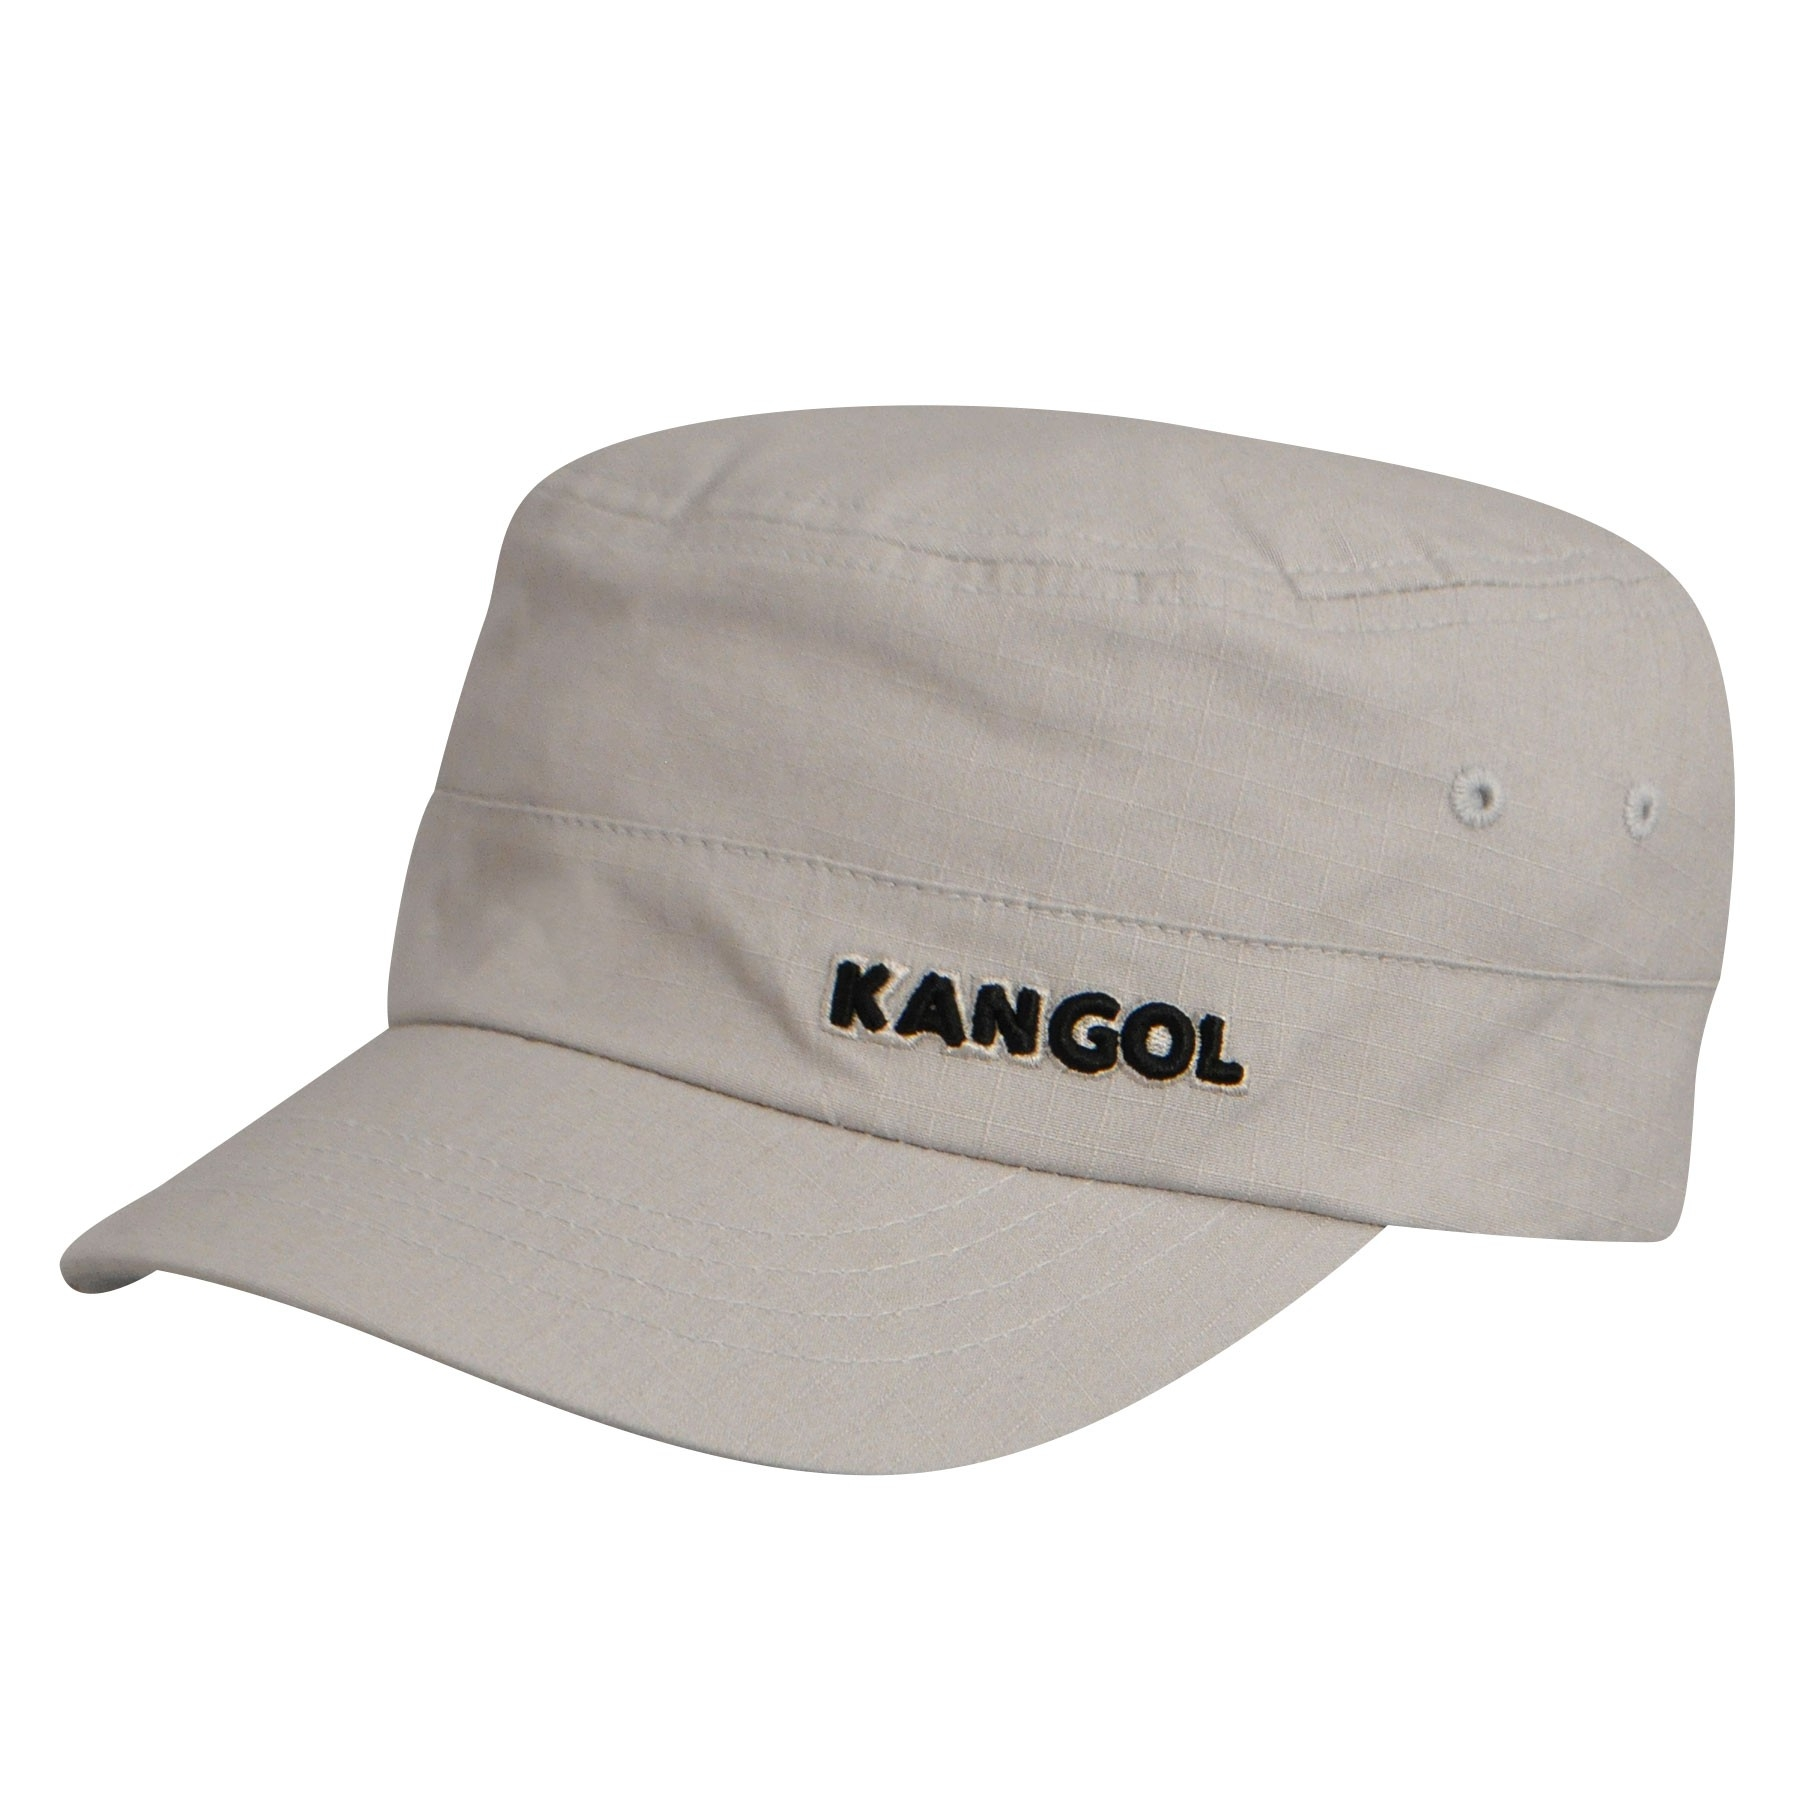 1d5a07cd332f7 Gorra Militar Kangol Gris - Tienda online Pingleton Hats